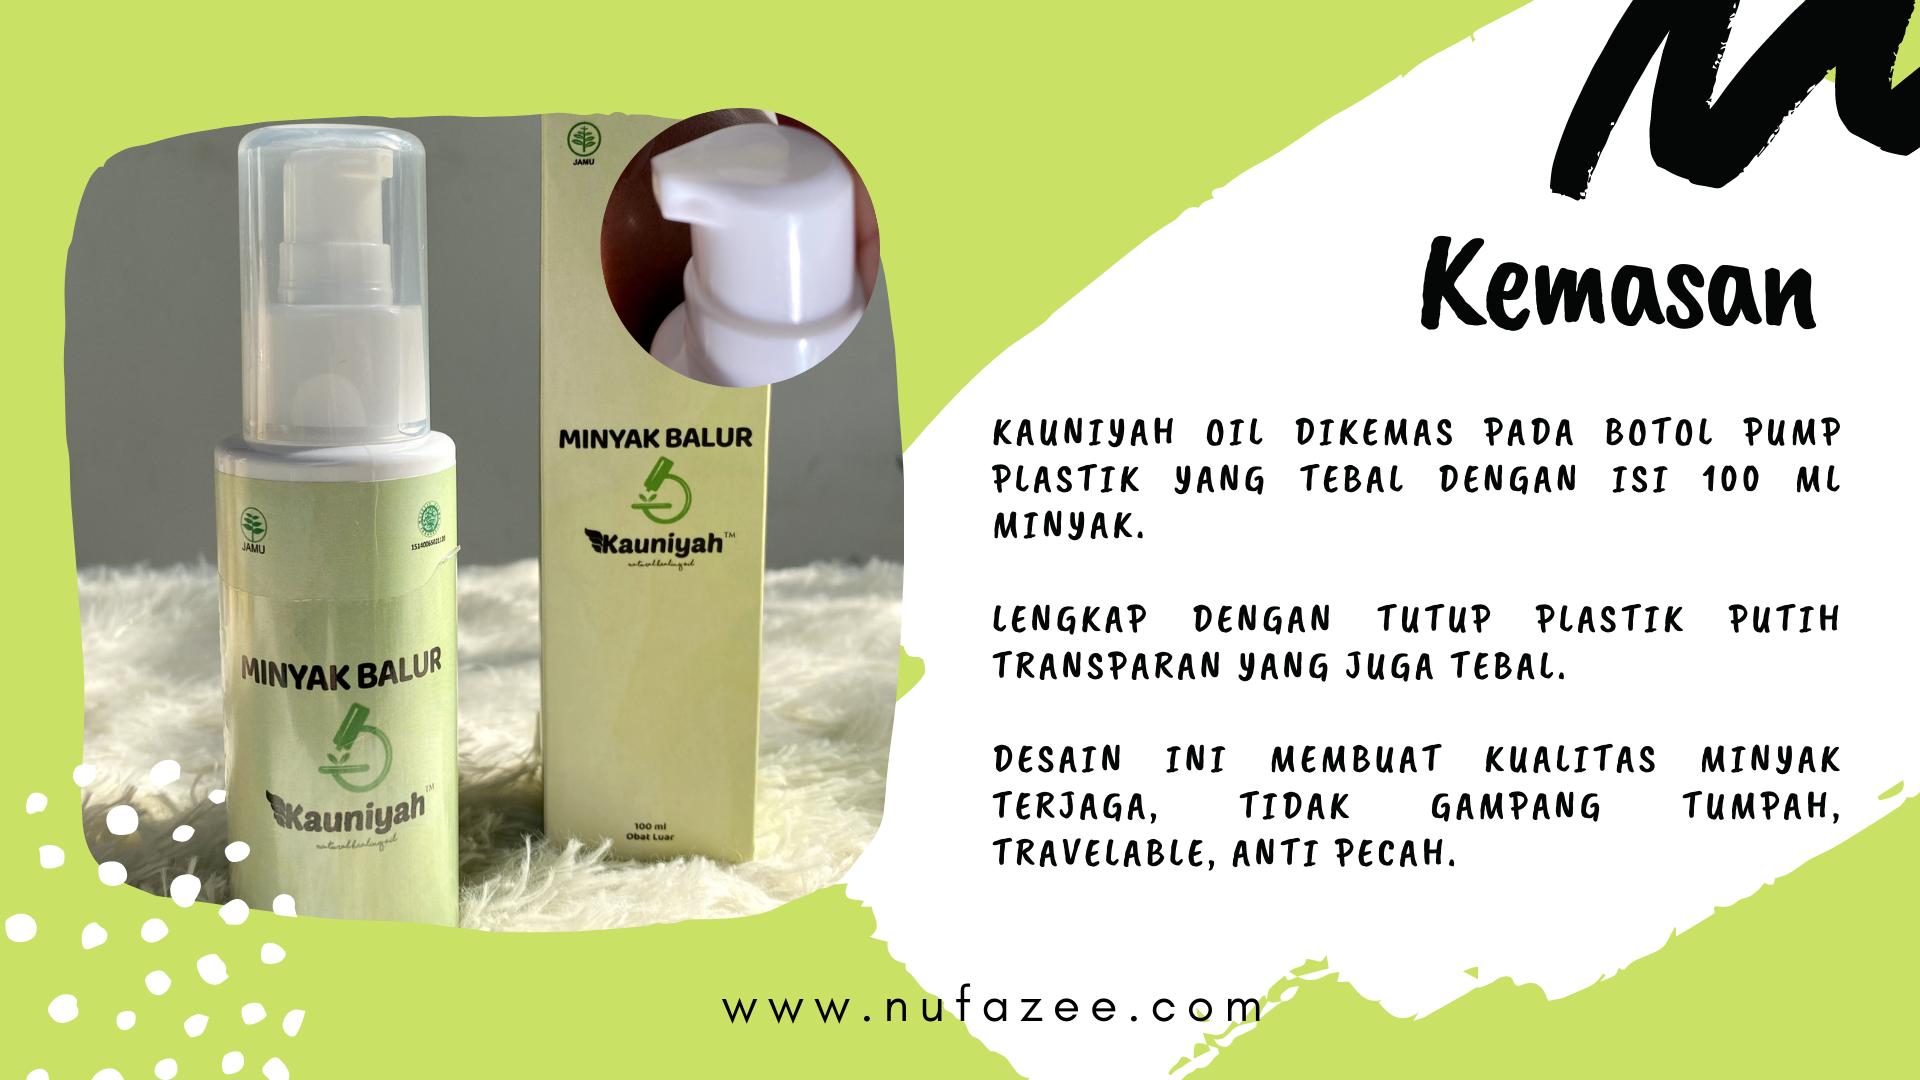 kauniyah oil 2